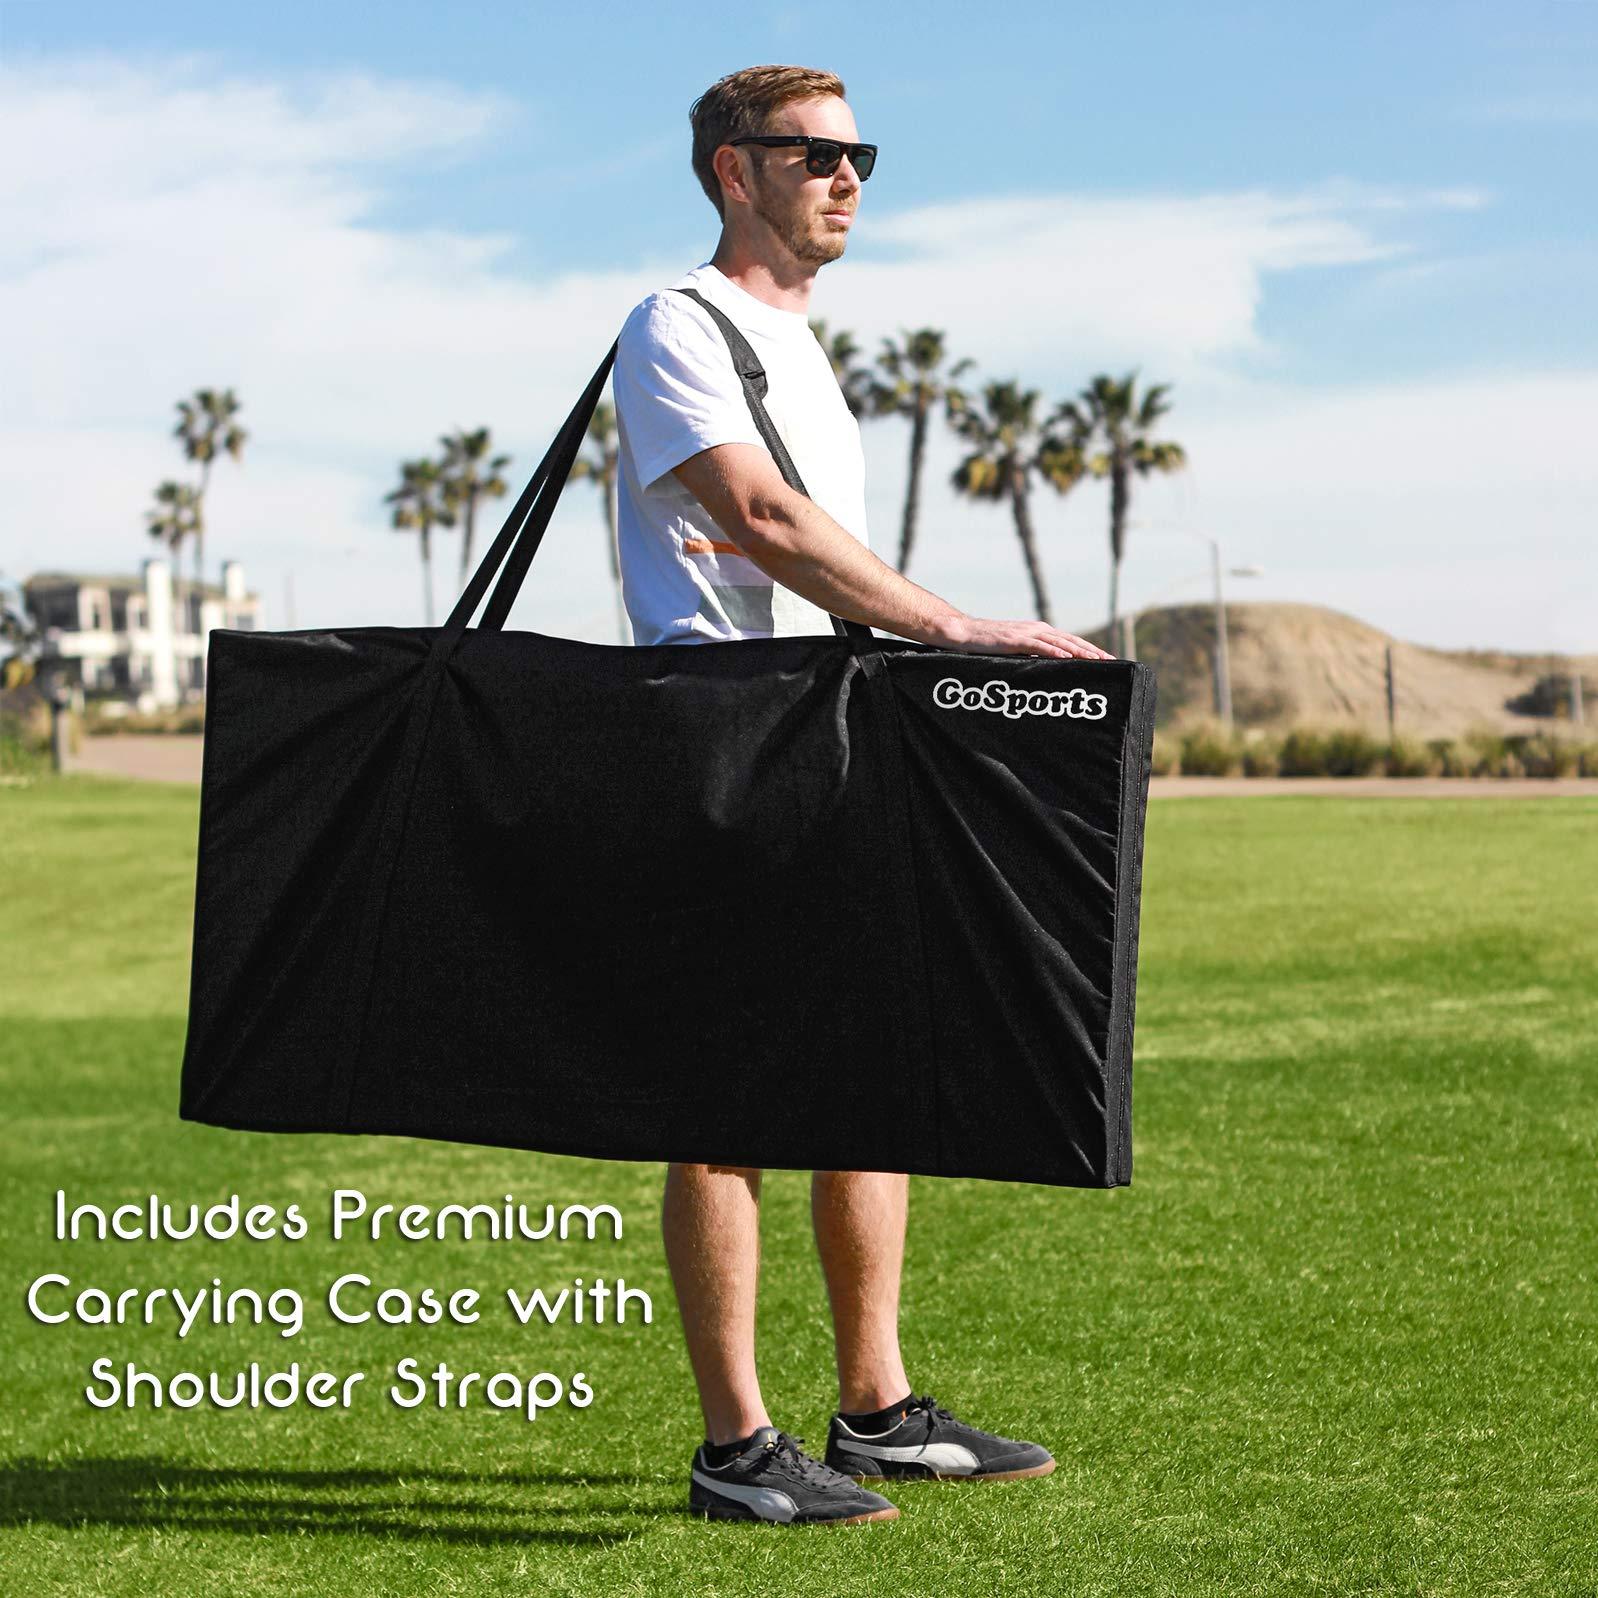 GoSports Bamboo Regulation Size Bamboo Cornhole Set   Includes 8 Bean Bags & Carrying Case by GoSports (Image #7)